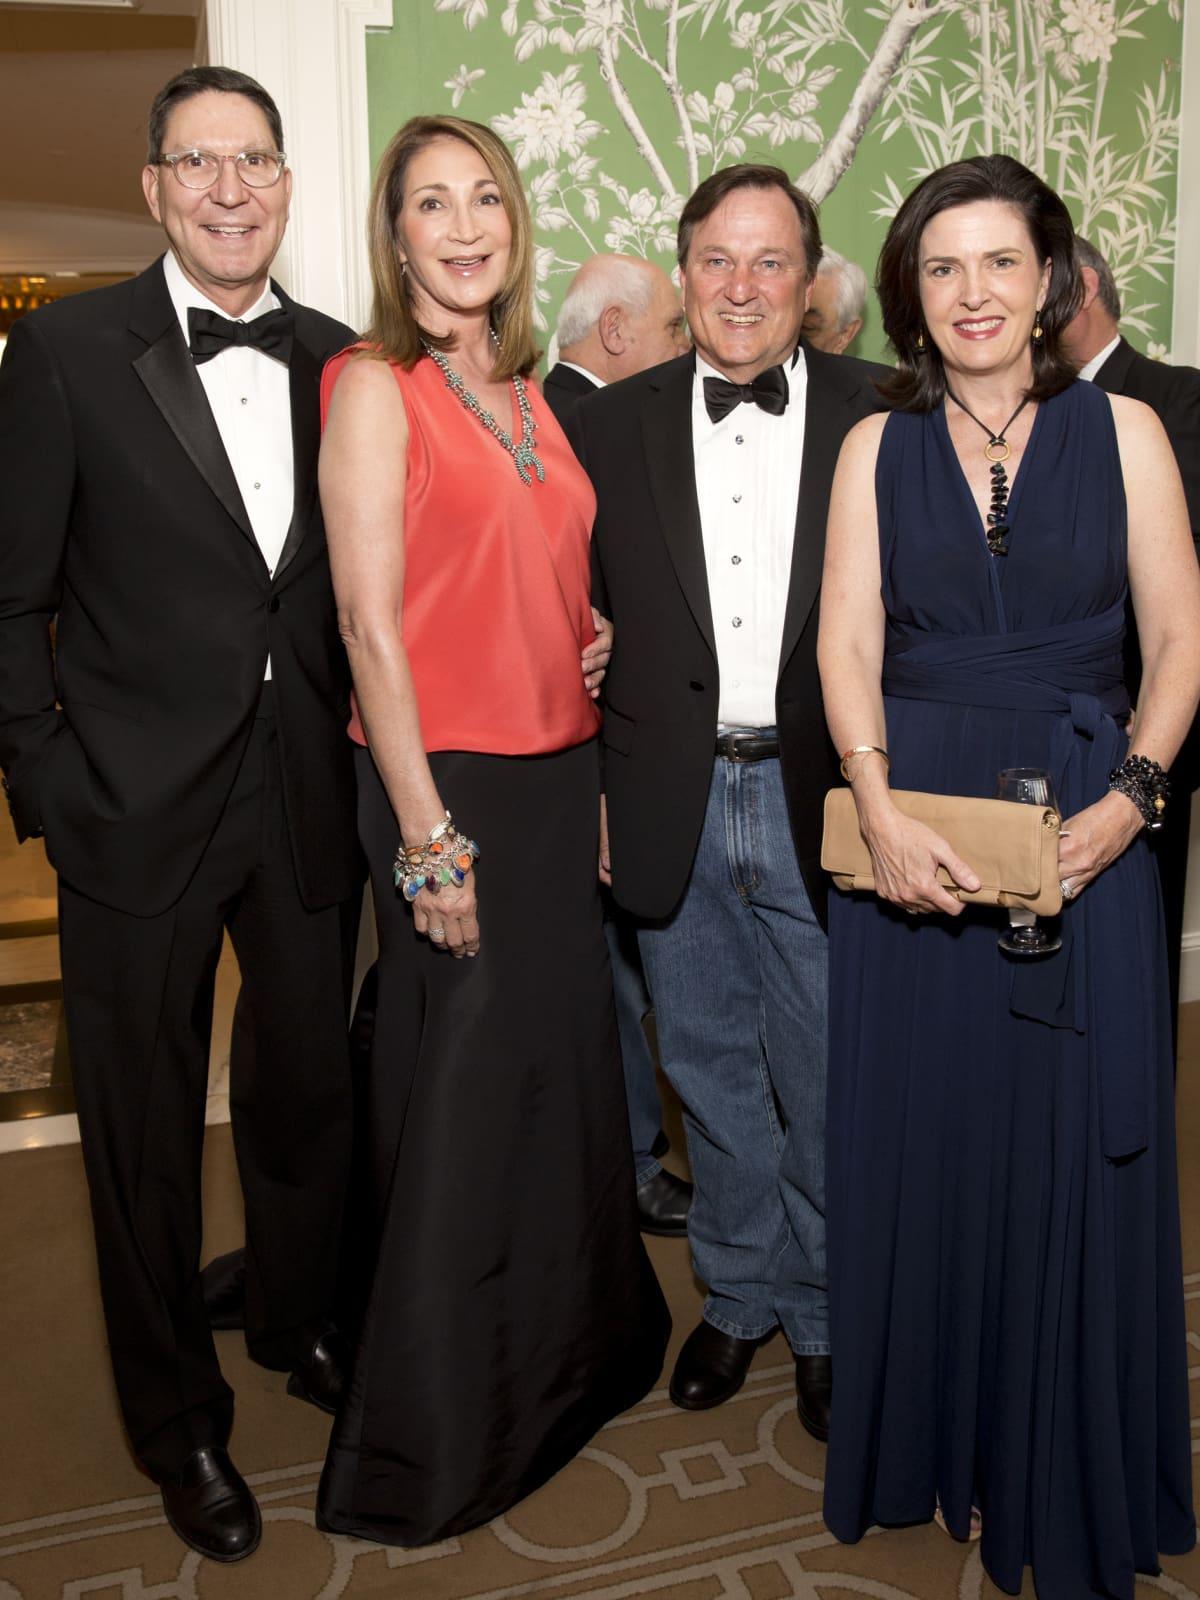 Houston, Blue Bird Circle Gala with Lyle Lovett, April 2017, Scott McClelland, Soraya McClelland, Virginia Tomlinson, Walter Tomlinson